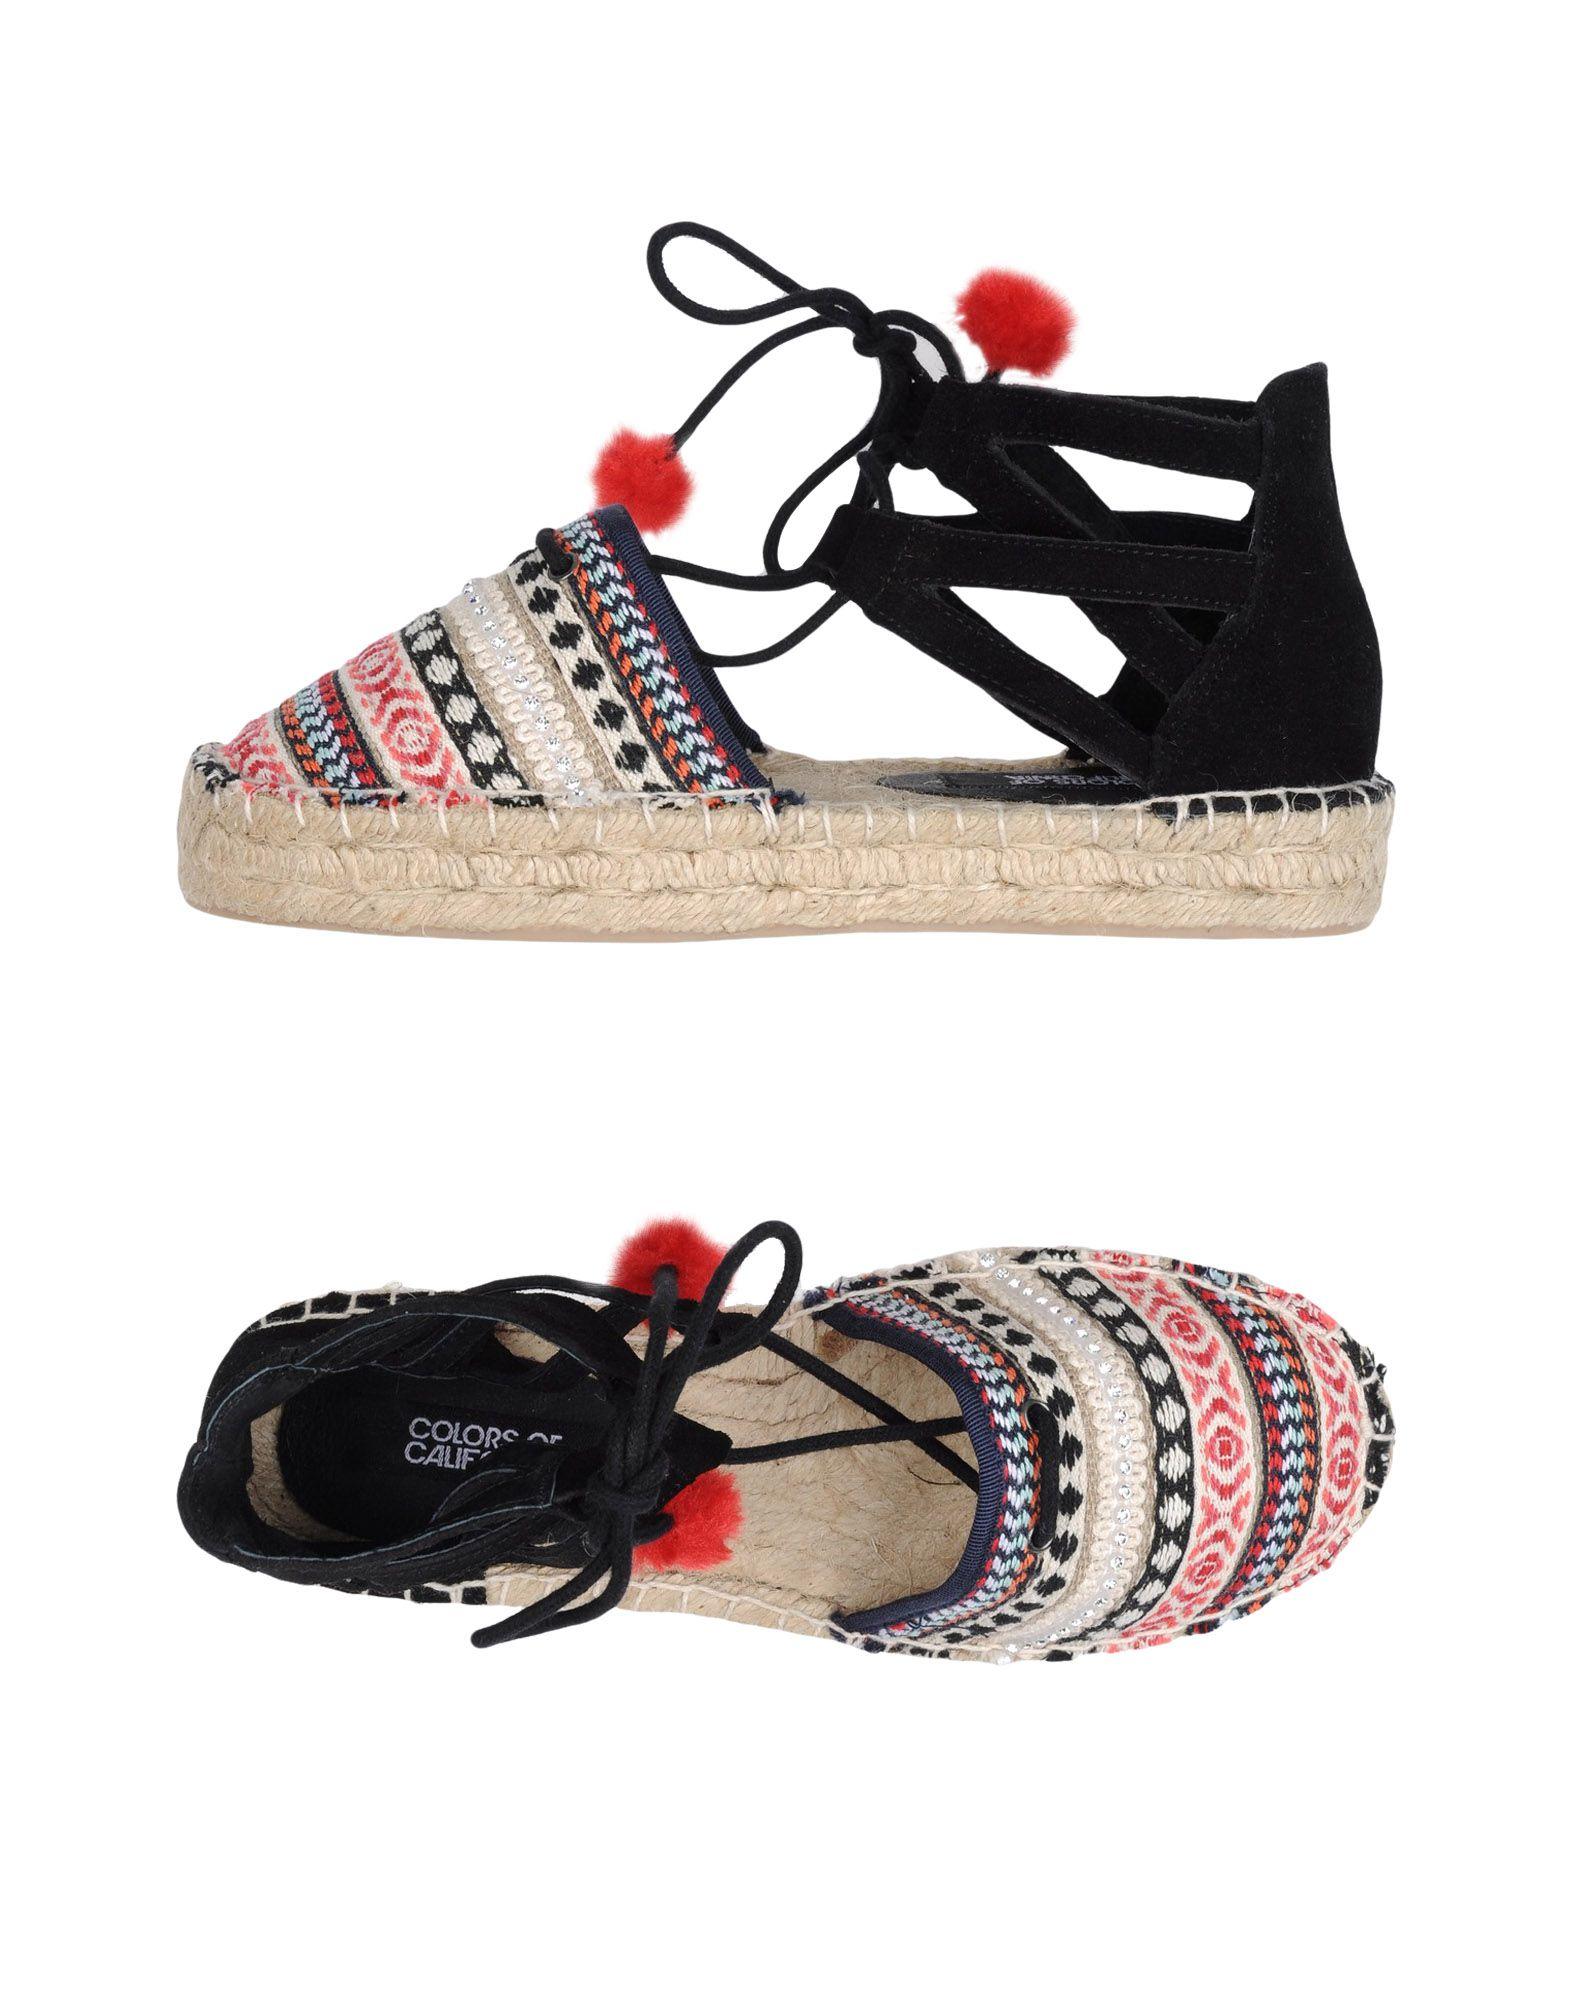 Colors Of California California Of Espadrilles Damen  11243745IV Gute Qualität beliebte Schuhe 19f5fb